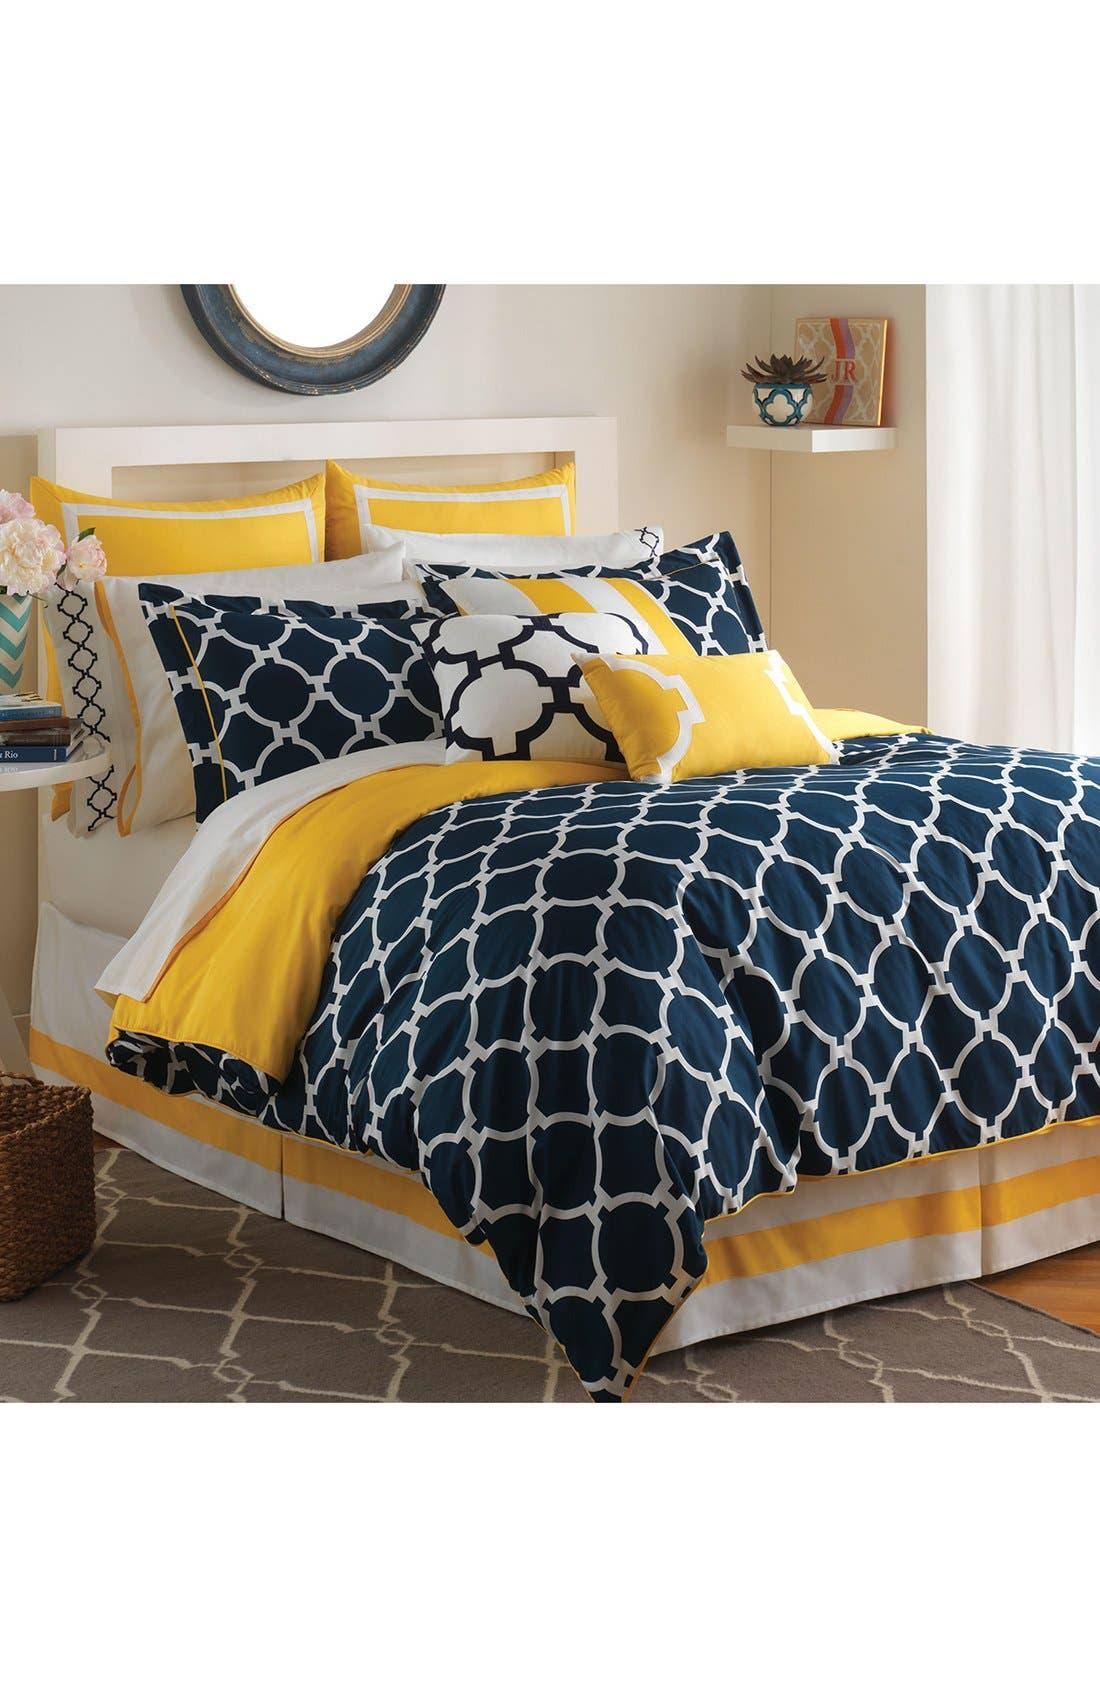 JILL ROSENWALD Hampton Links Reversible Comforter, Sham &